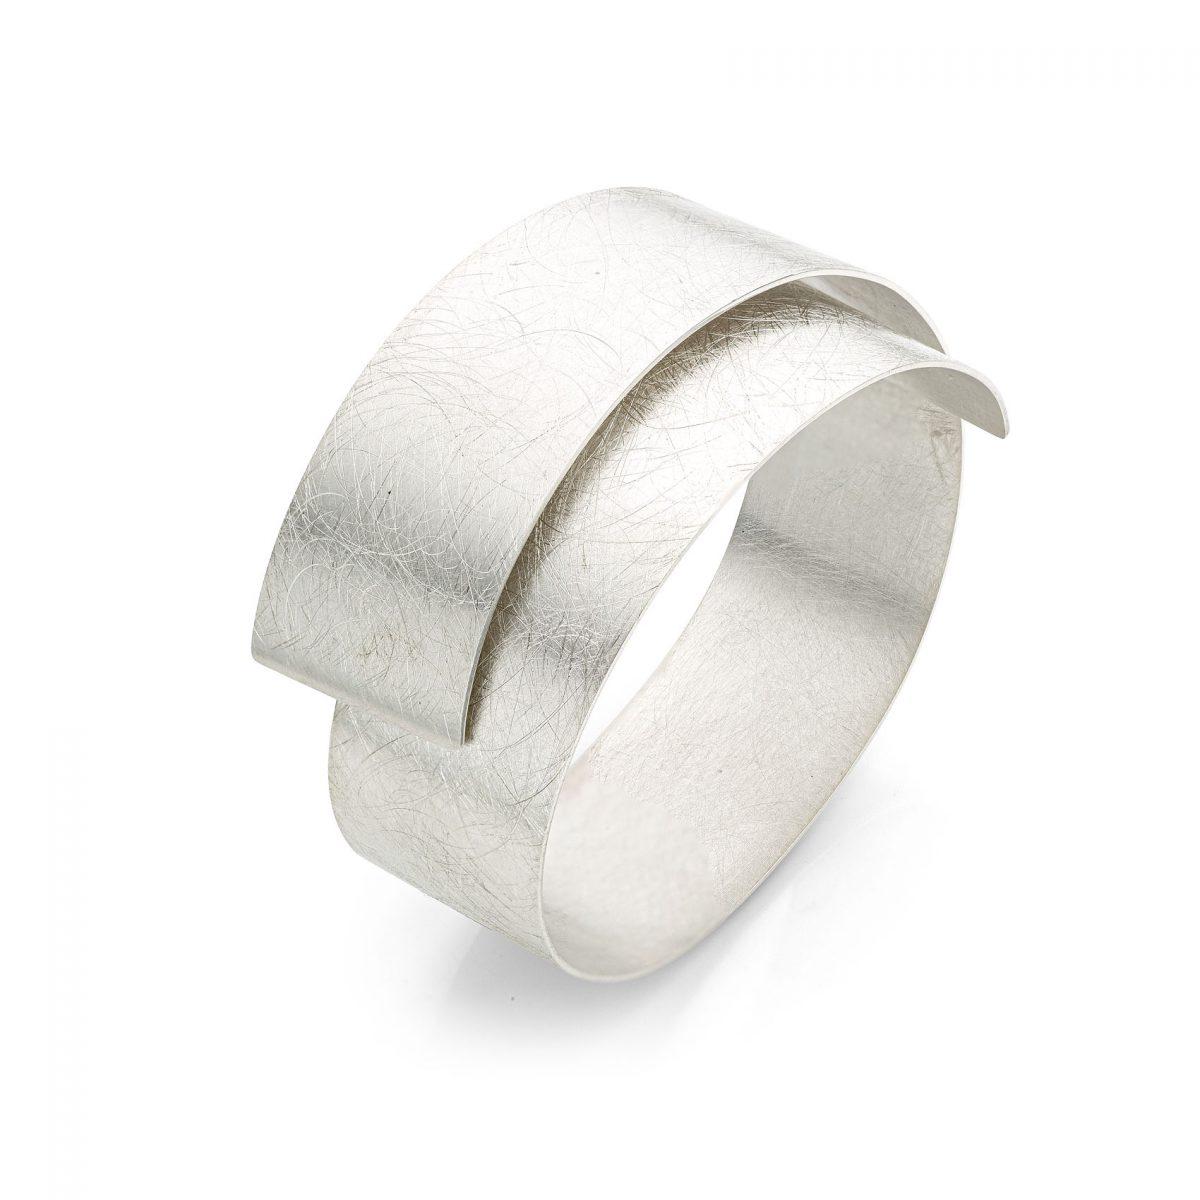 MOYA sheet bracelet 20mm